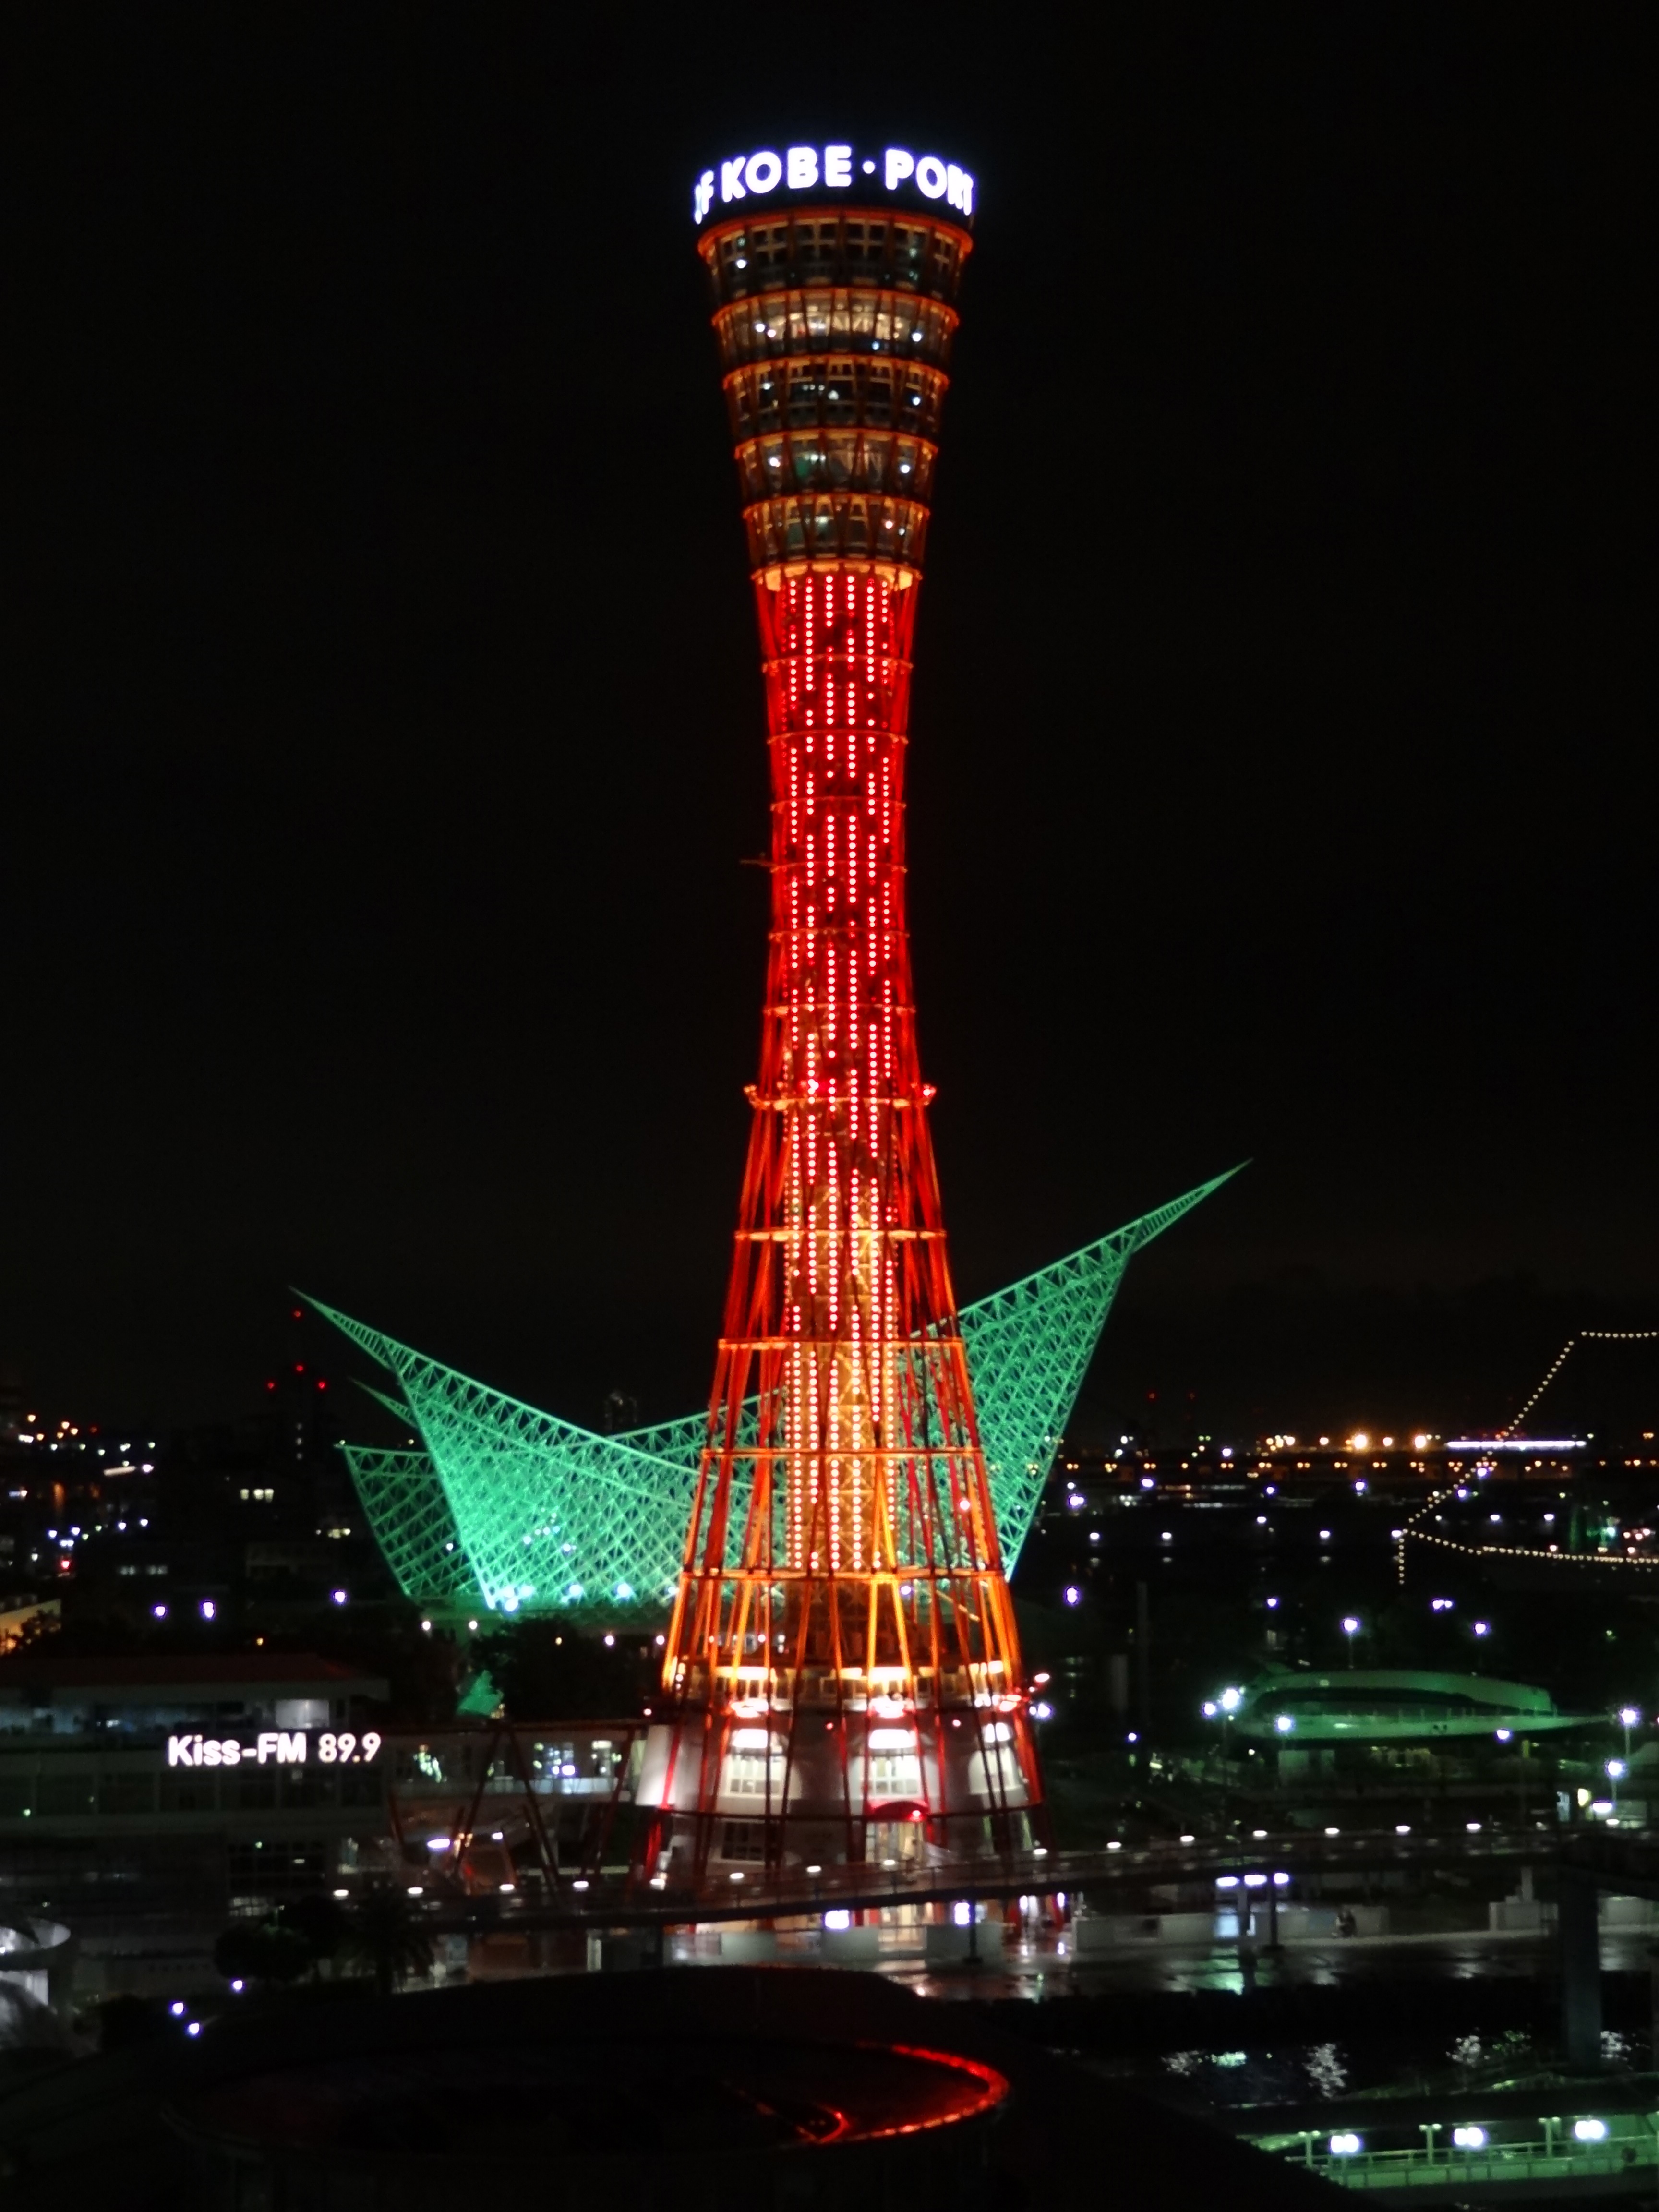 File:Kobe port tower 01.jpg